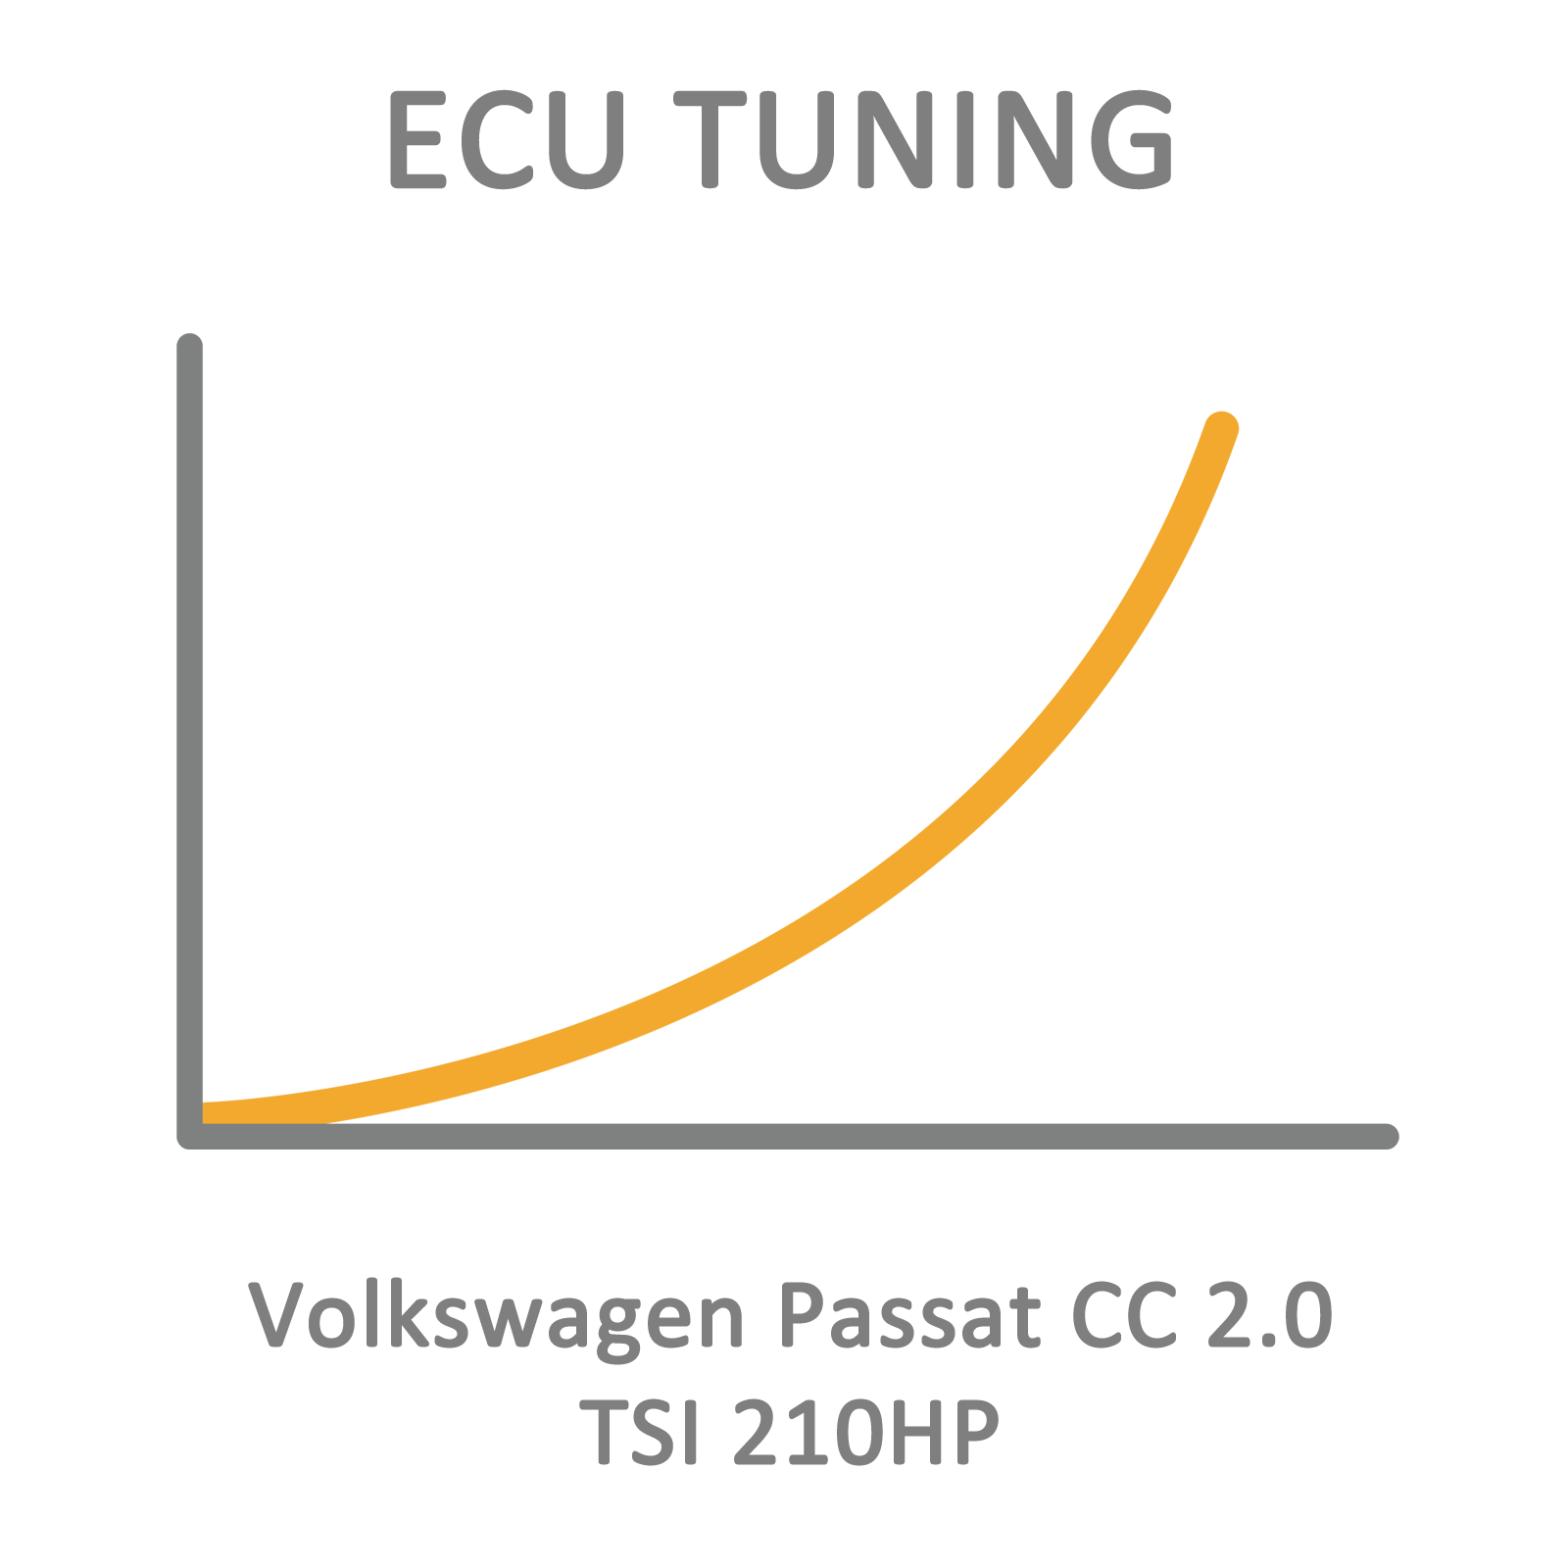 Volkswagen Passat CC 2.0 TSI 210HP ECU Tuning Remapping